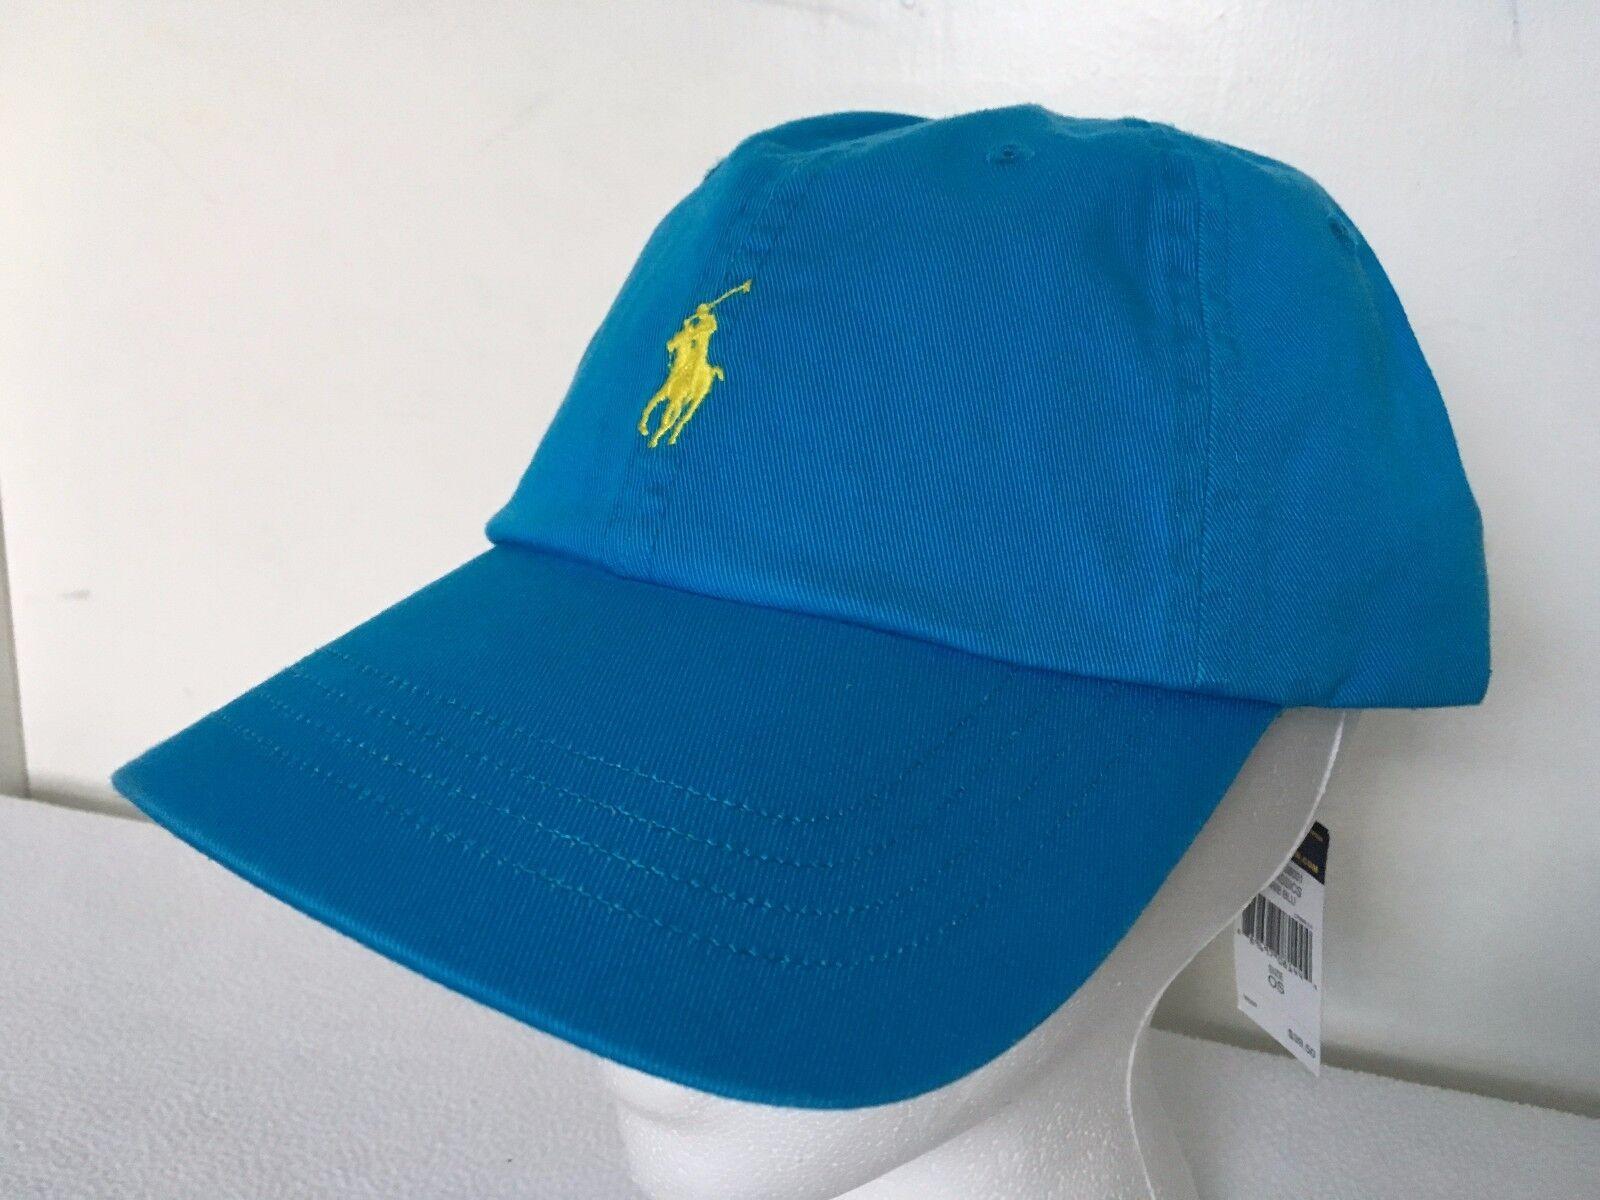 Polo Polo Polo Ralph Lauren Hat Baseball Cap~Caribbean Blue~Fabric Strap~Yellow Logo~NWT 6a0256